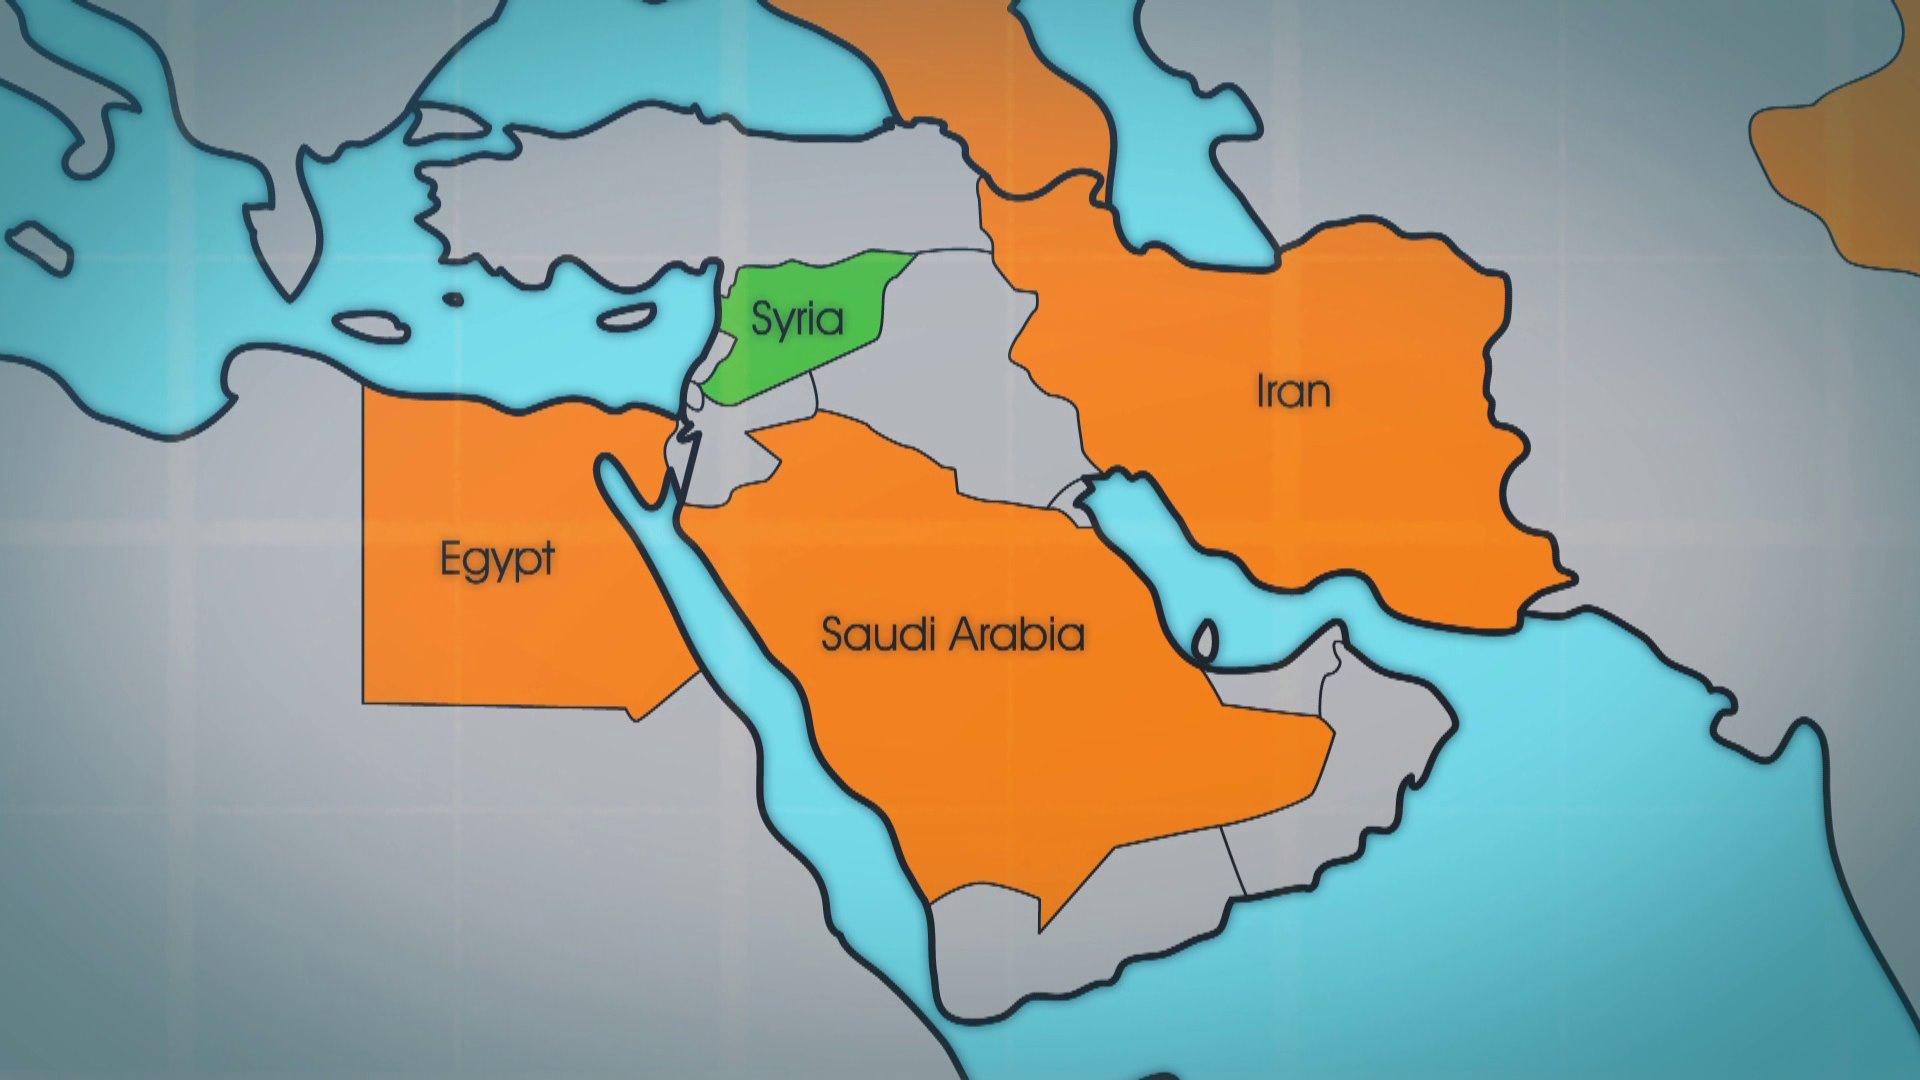 Saudi Arabia Egypt Show Discord Over Syria AP Platos Guns - Map of egypt and saudi arabia